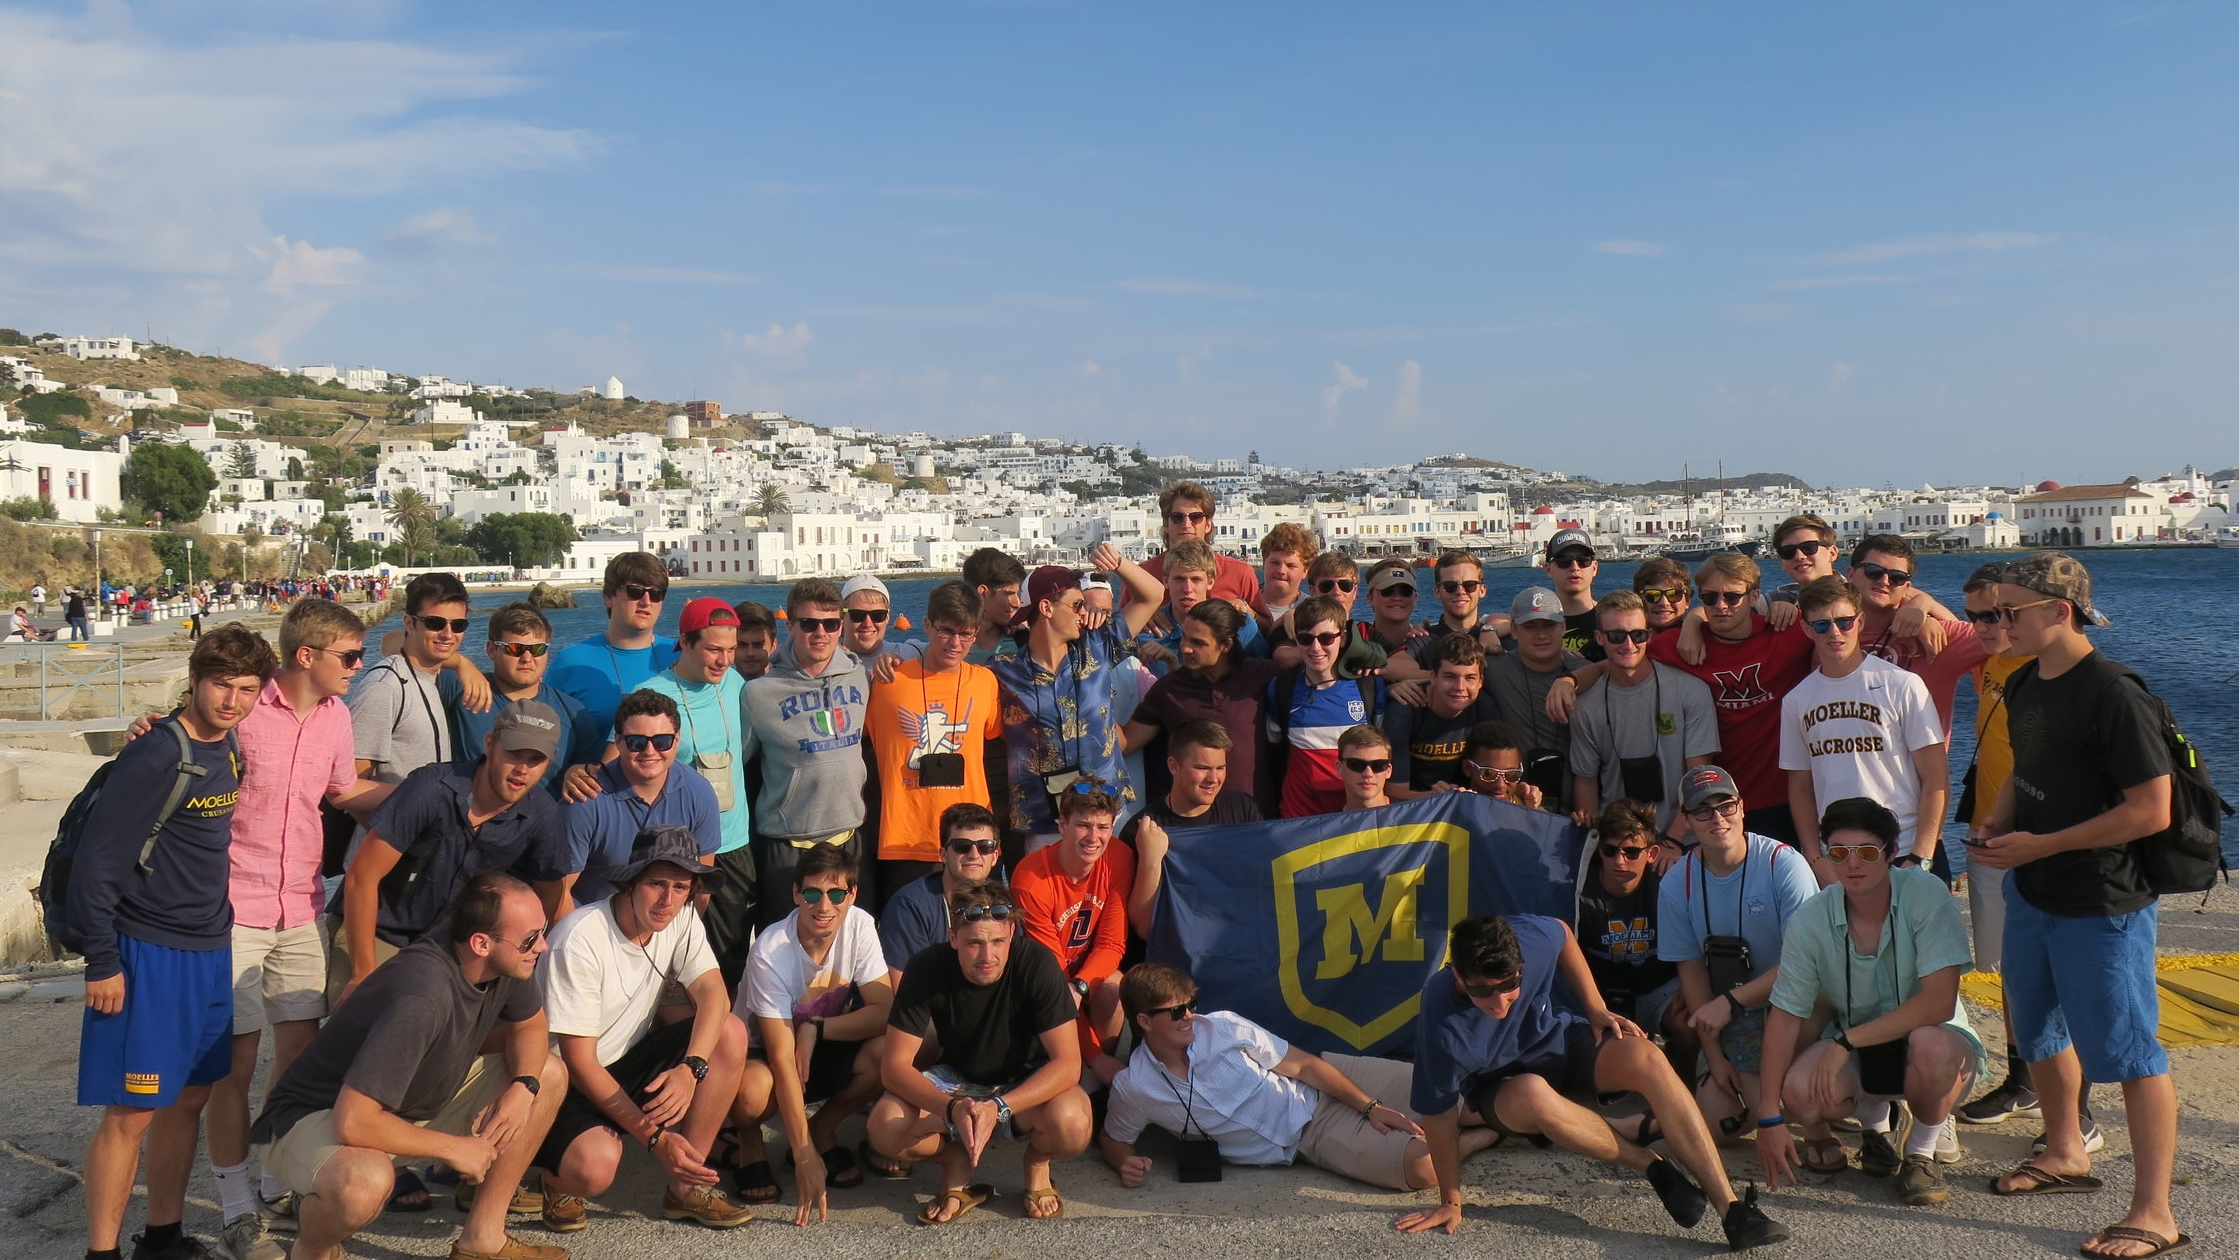 Moeller Class of 2017 visit Greece on their Senior Trip  Photo by: Matthew Jackson